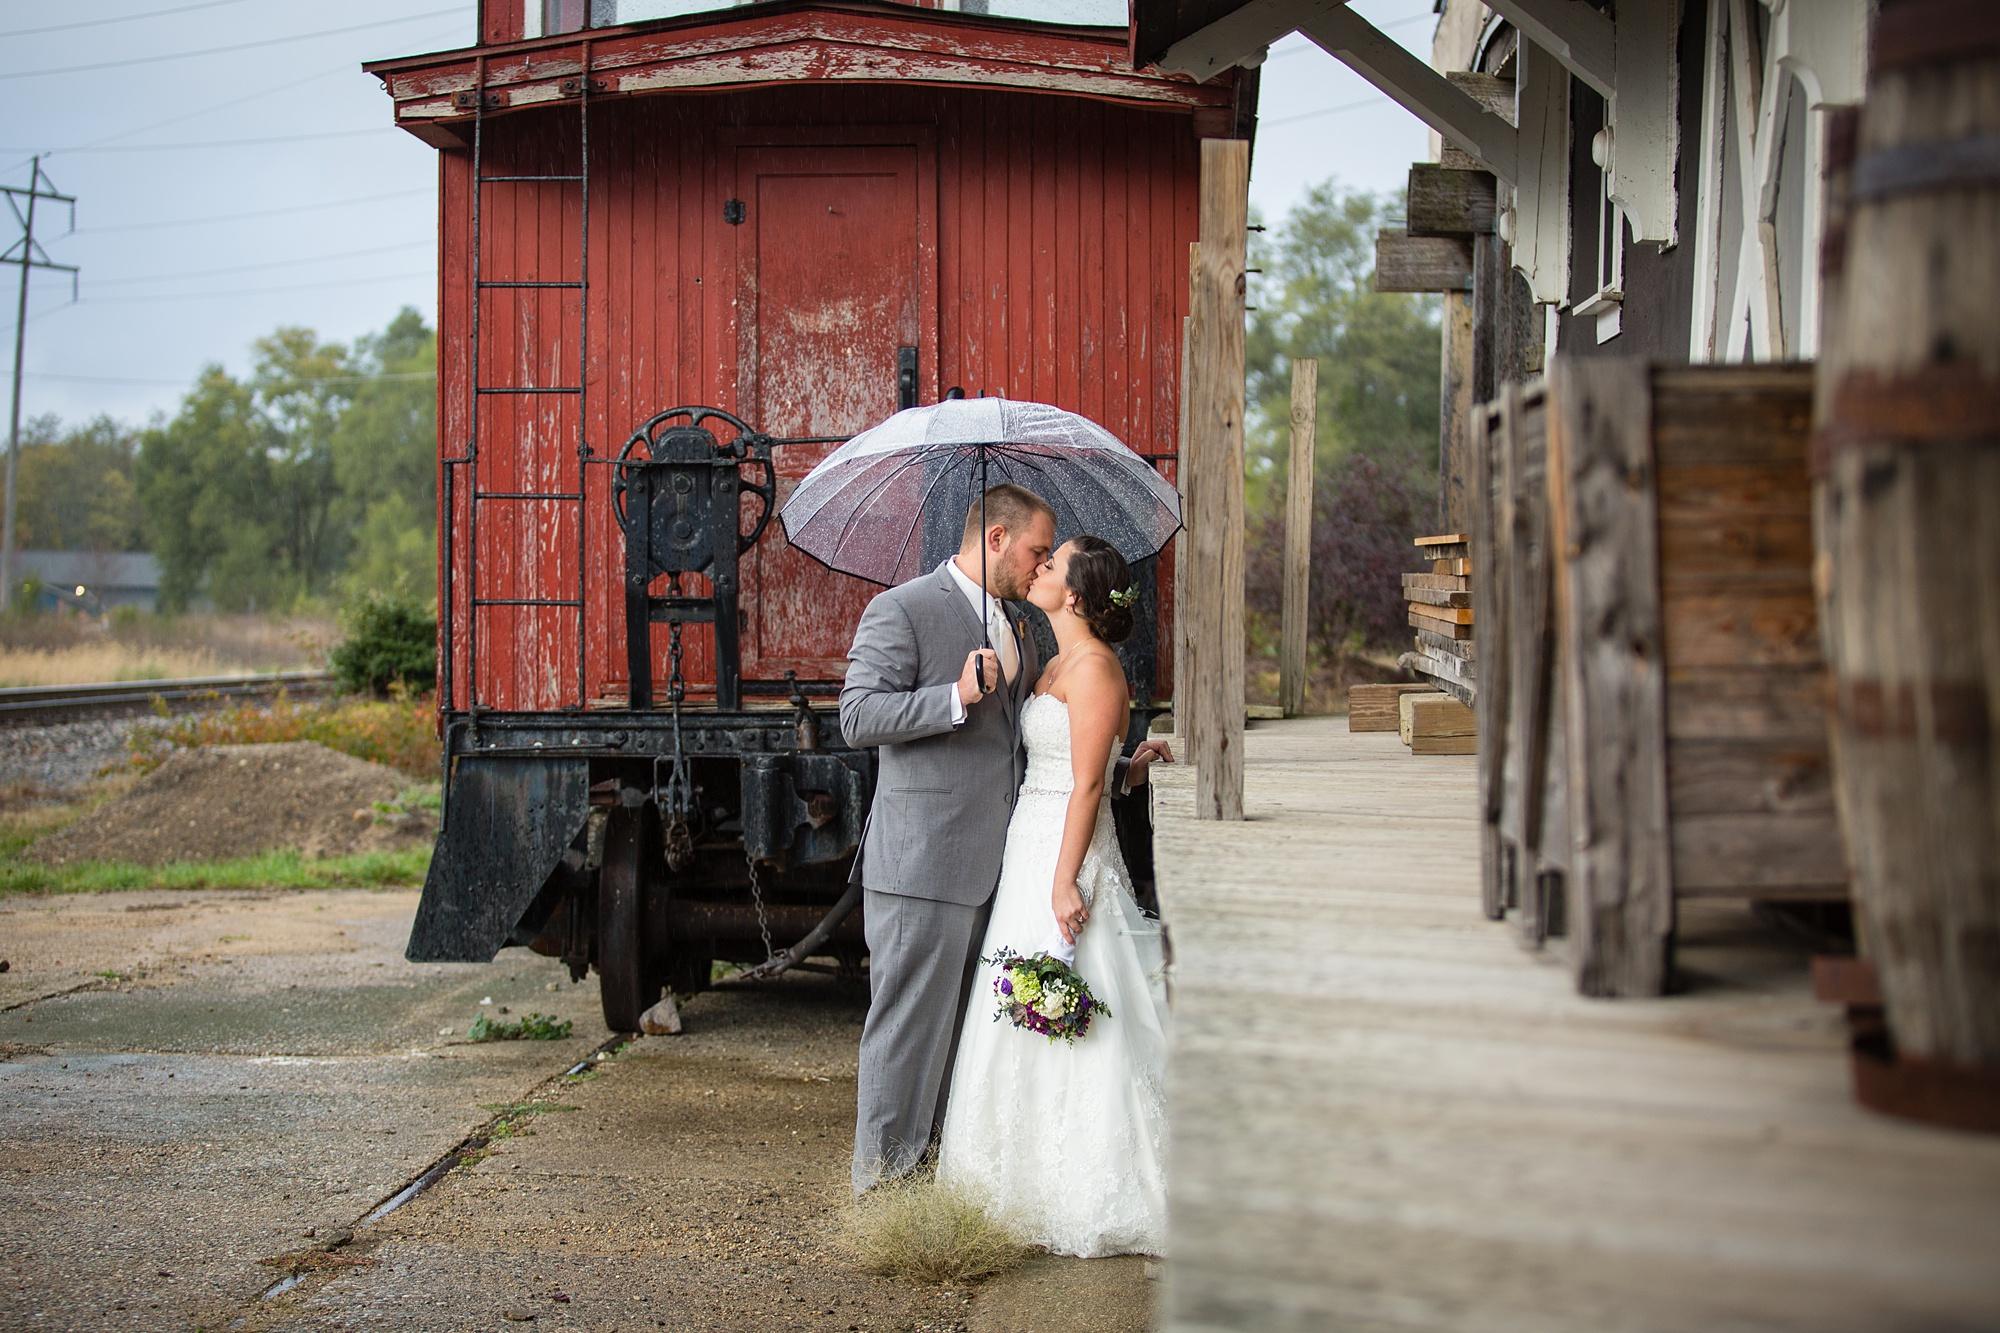 Brandon_Shafer_Photography_Emily_Travis_Kalamazoo_Wedding_Photography_0039.jpg